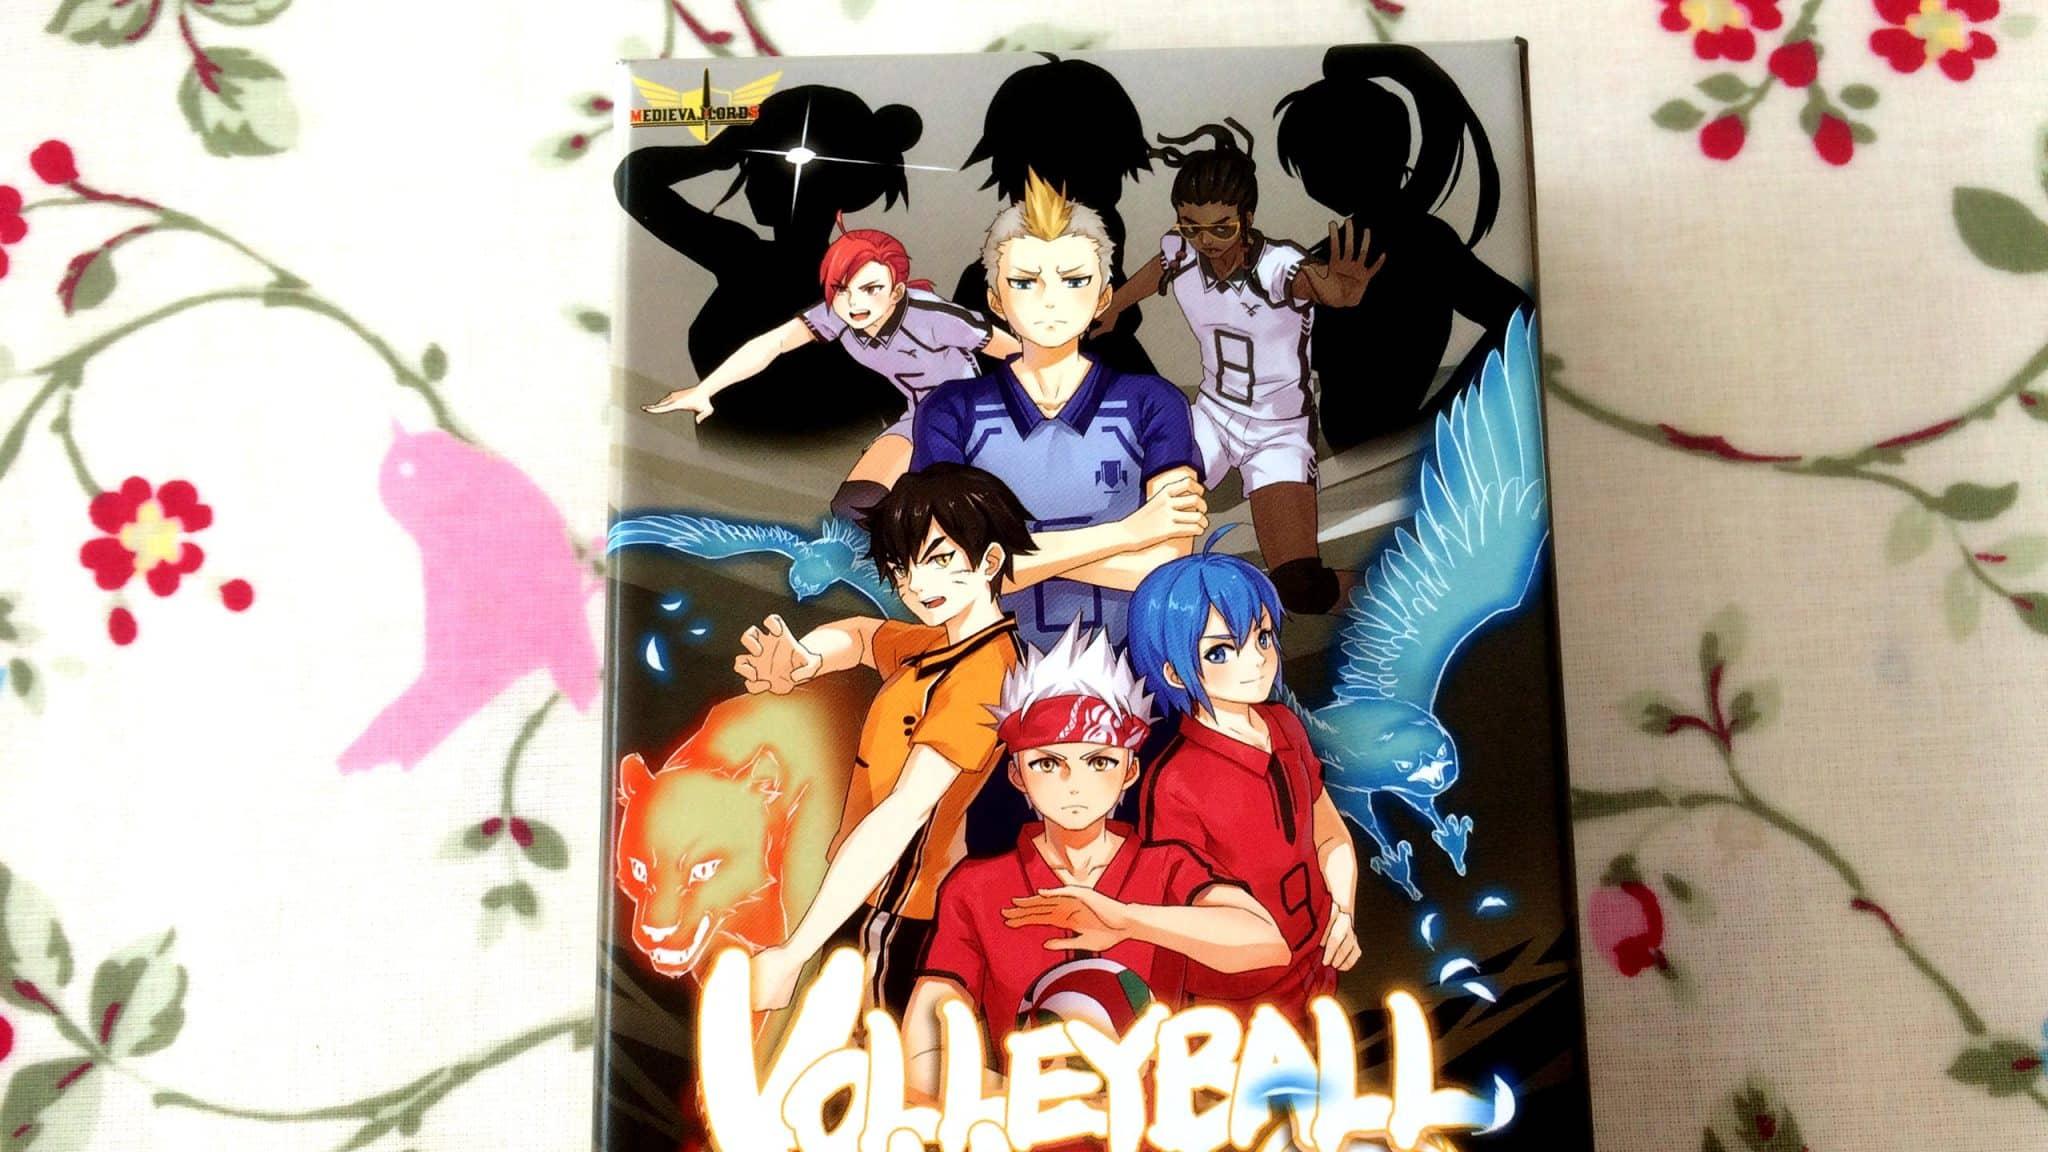 Volleyball High